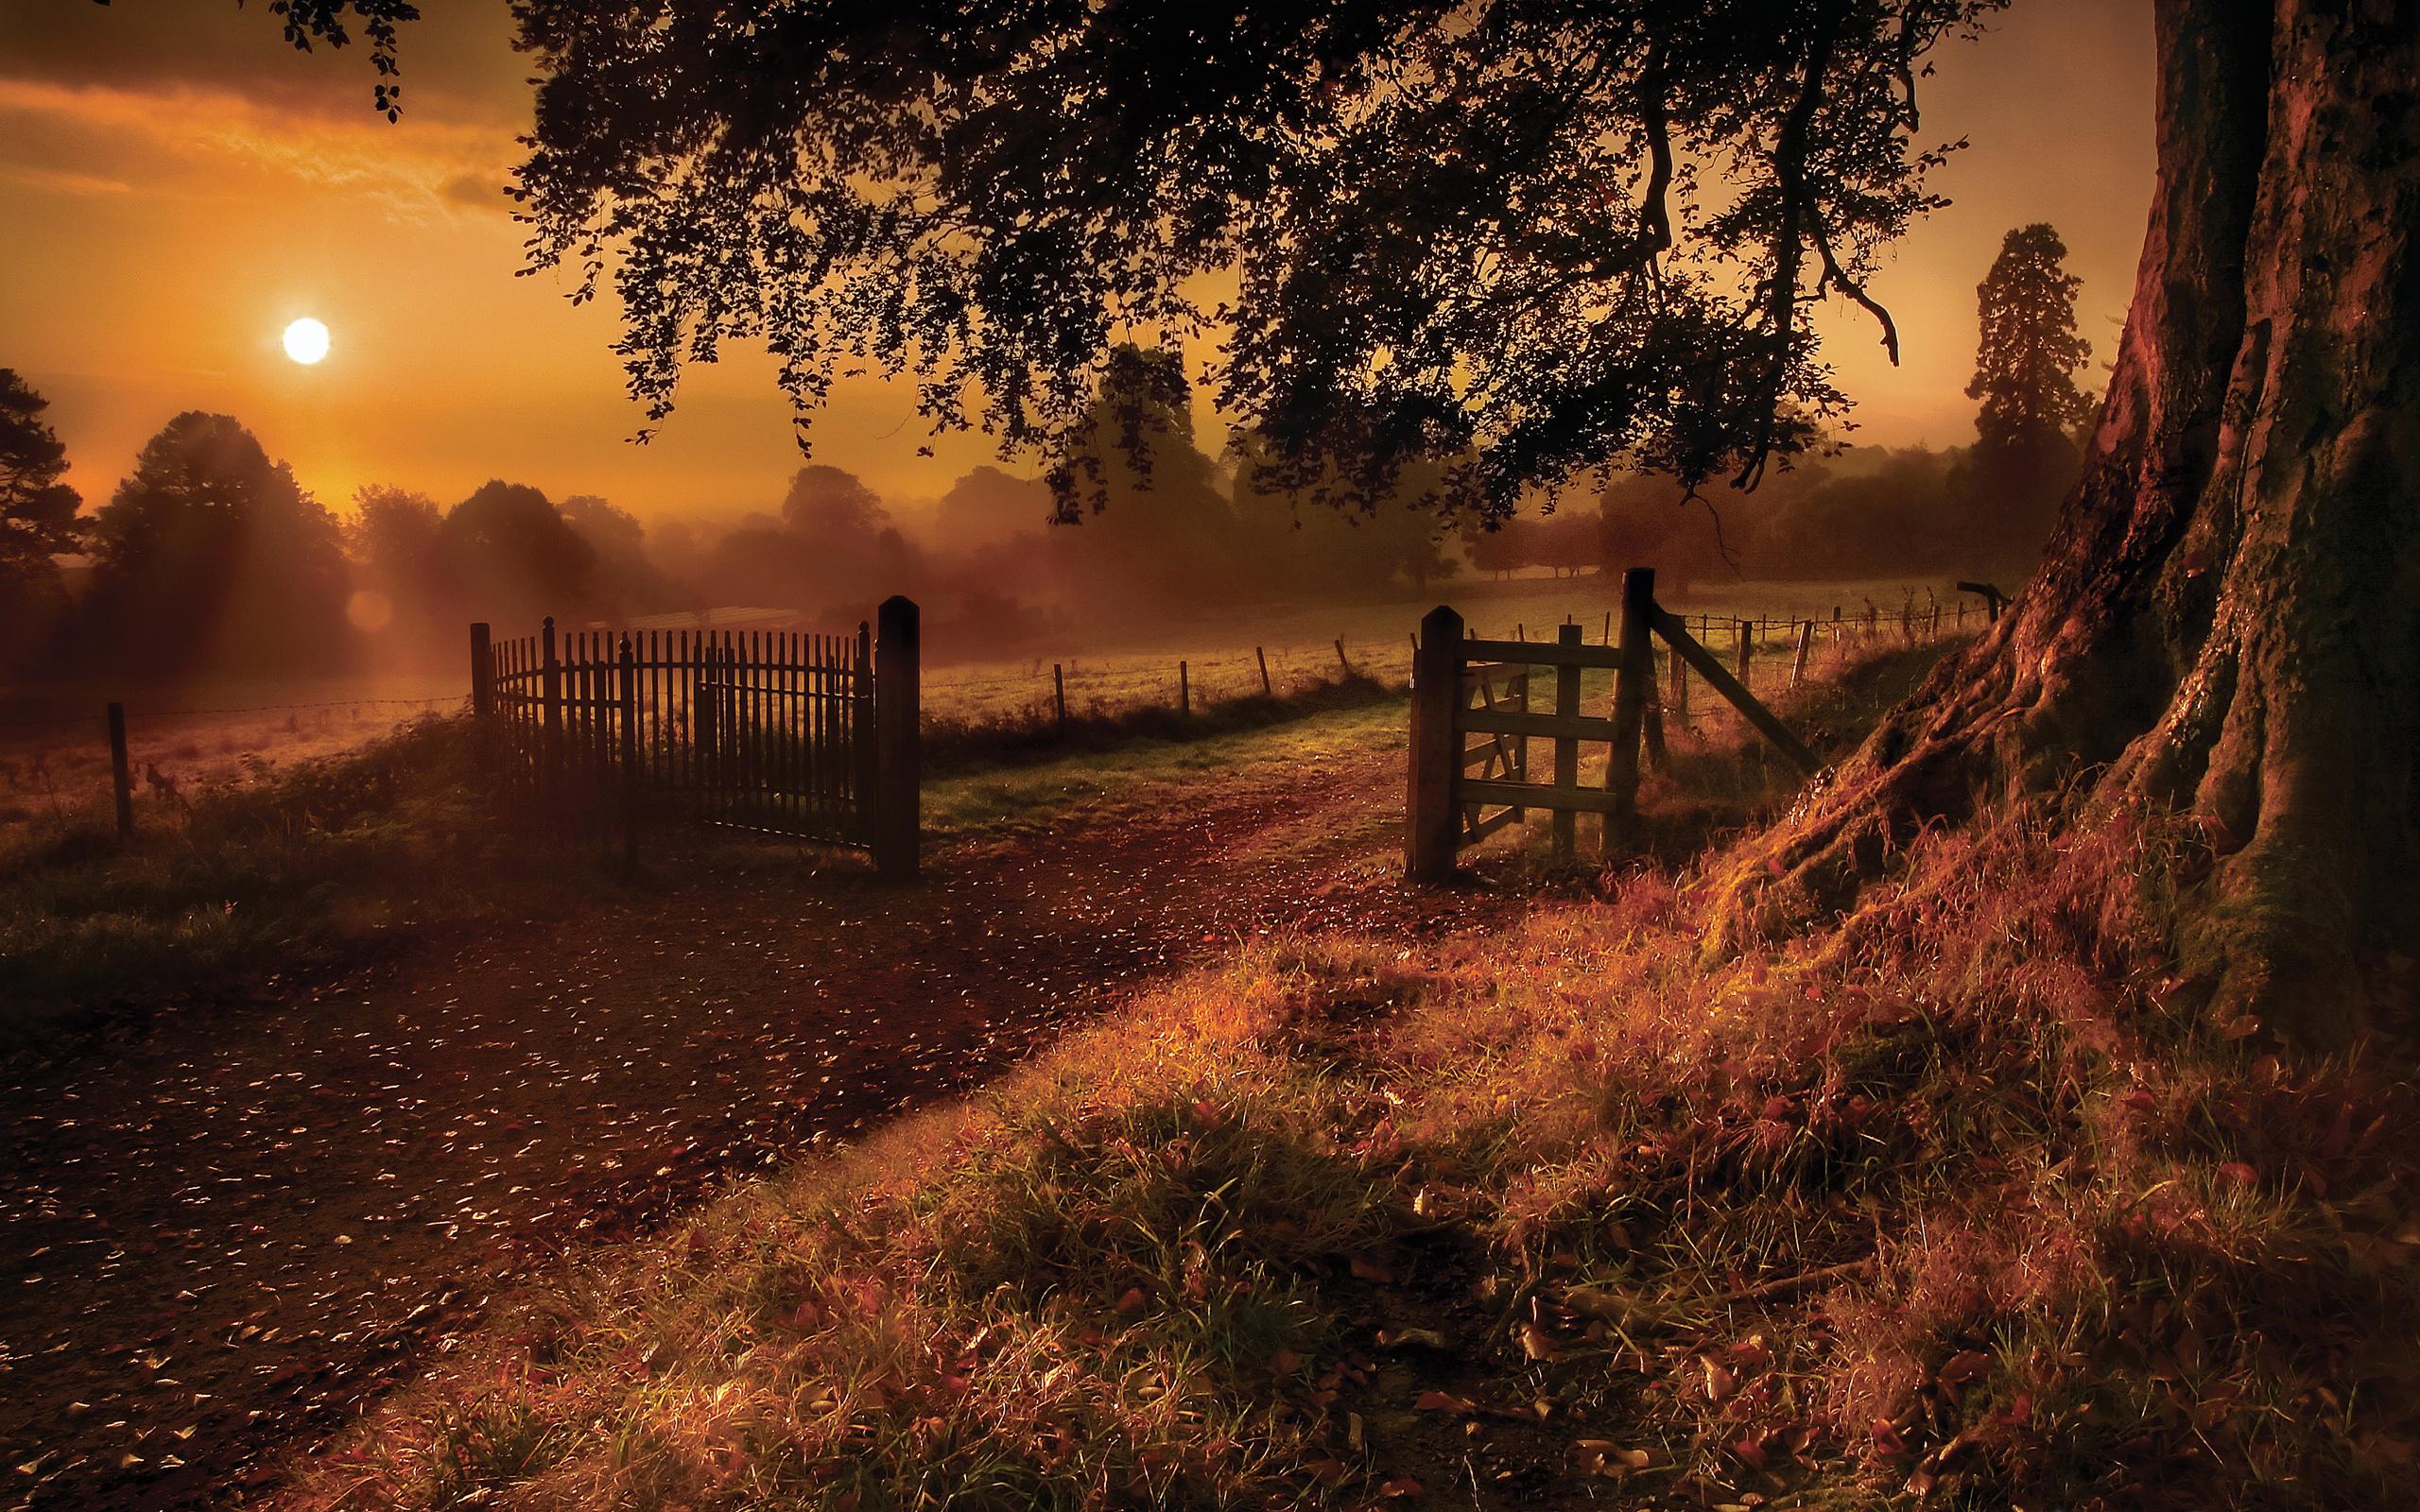 Download old road gate farm ranch wallpaper 2560x1600jpg 2560x1600